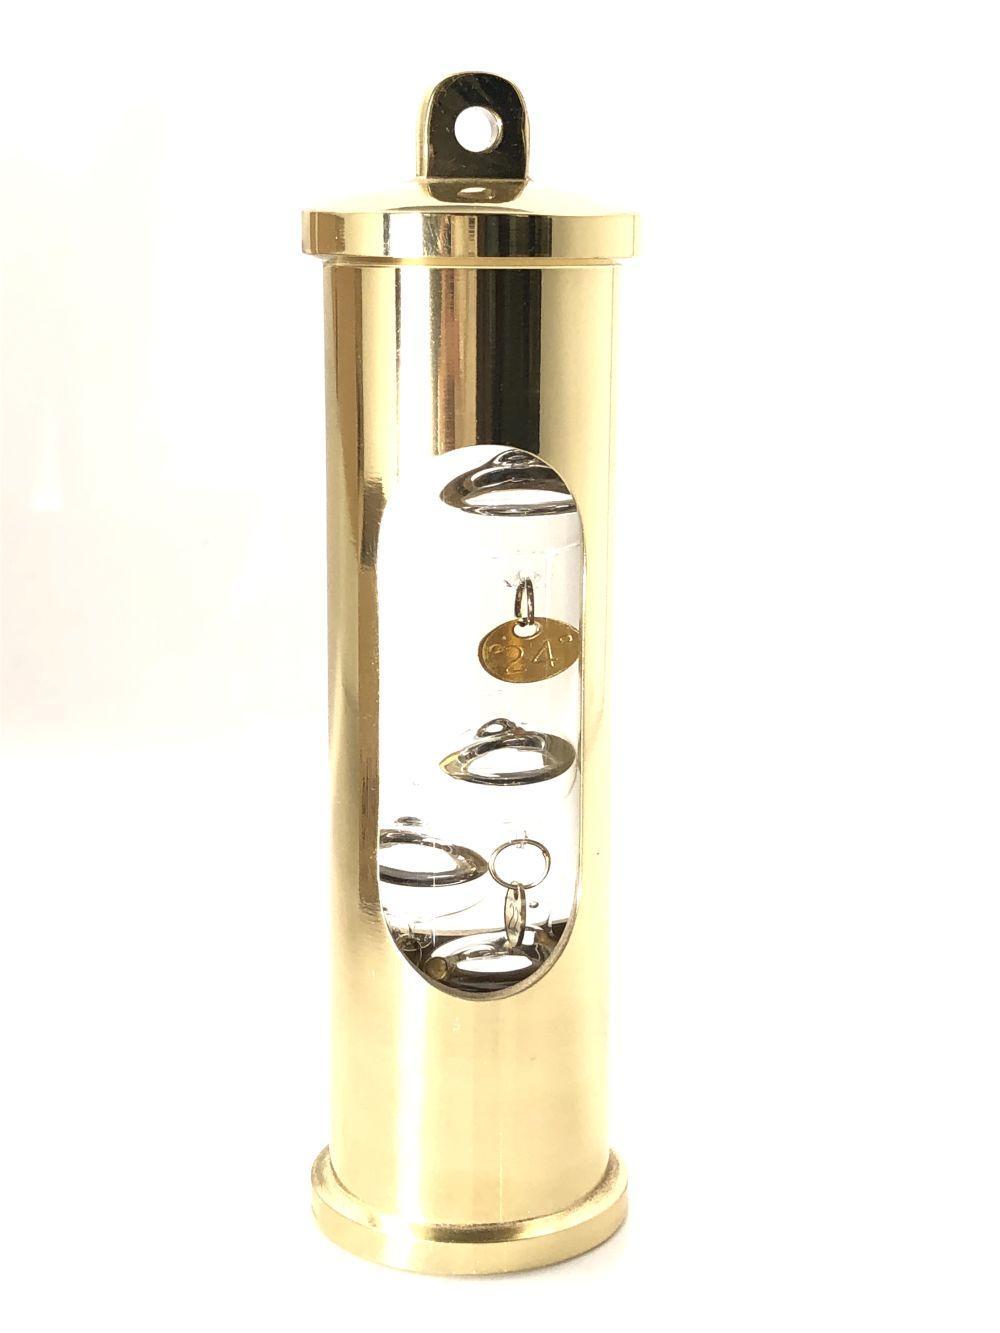 Danish Copenhagen Brass Galileiglass with Wall Mount in Original Box